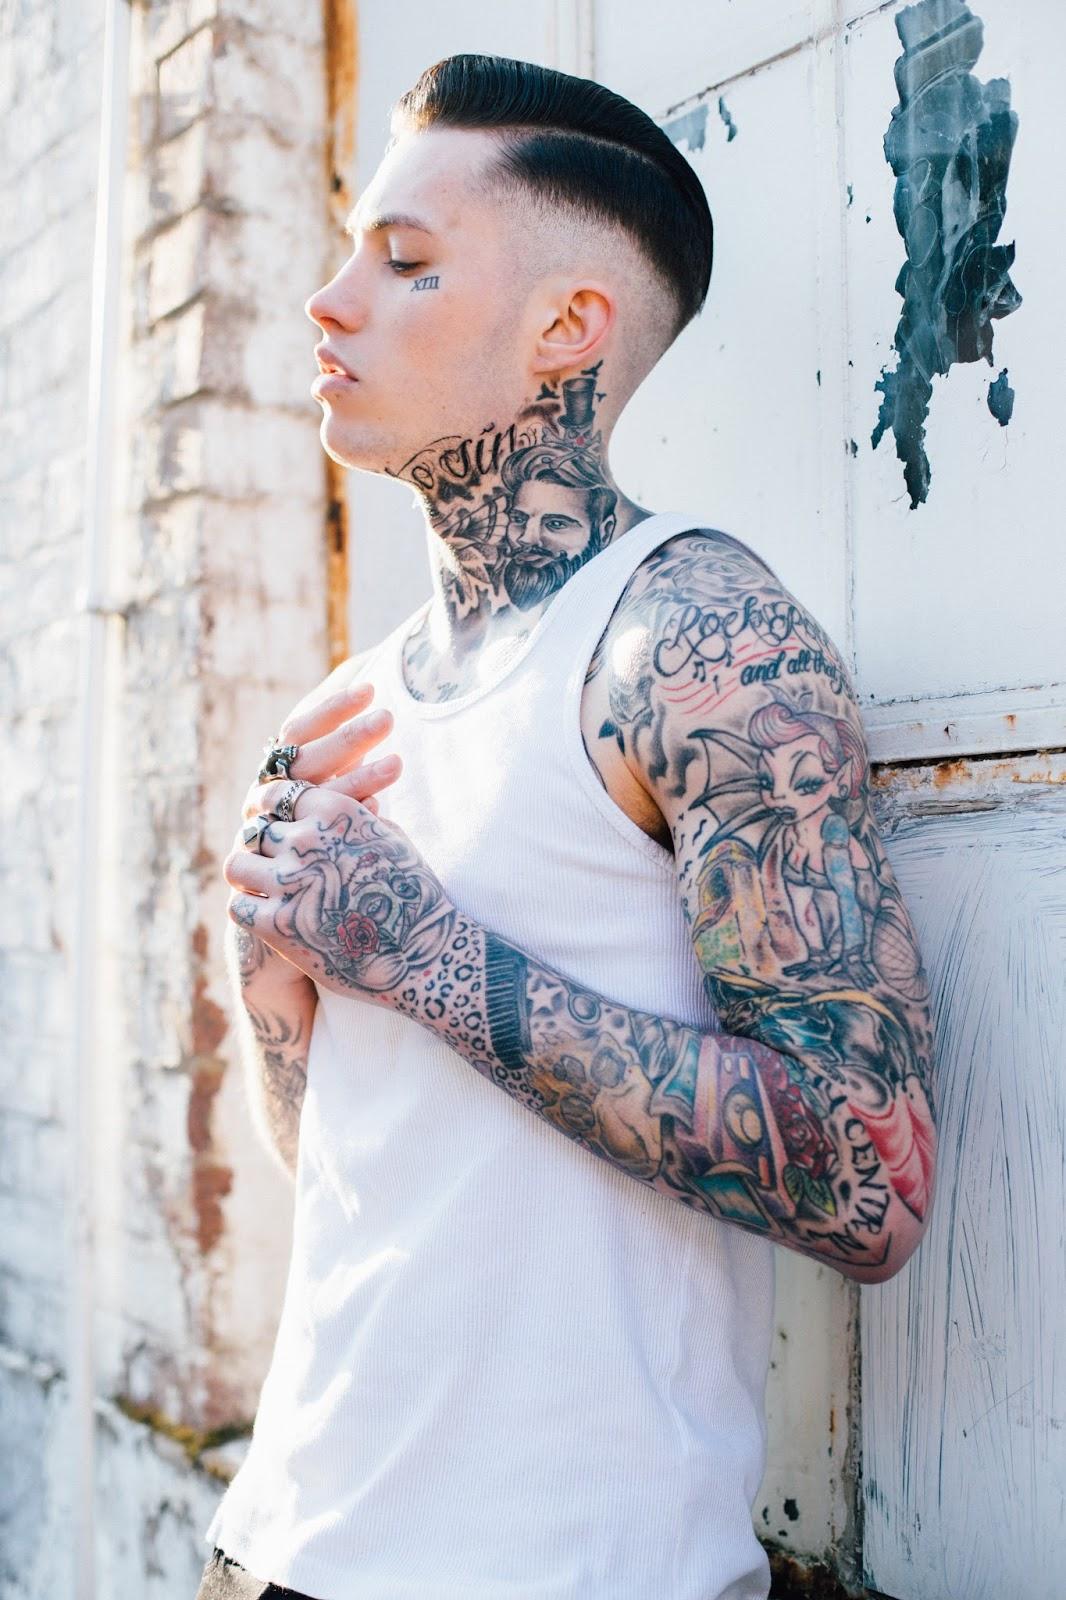 Ryan Davies-Hall